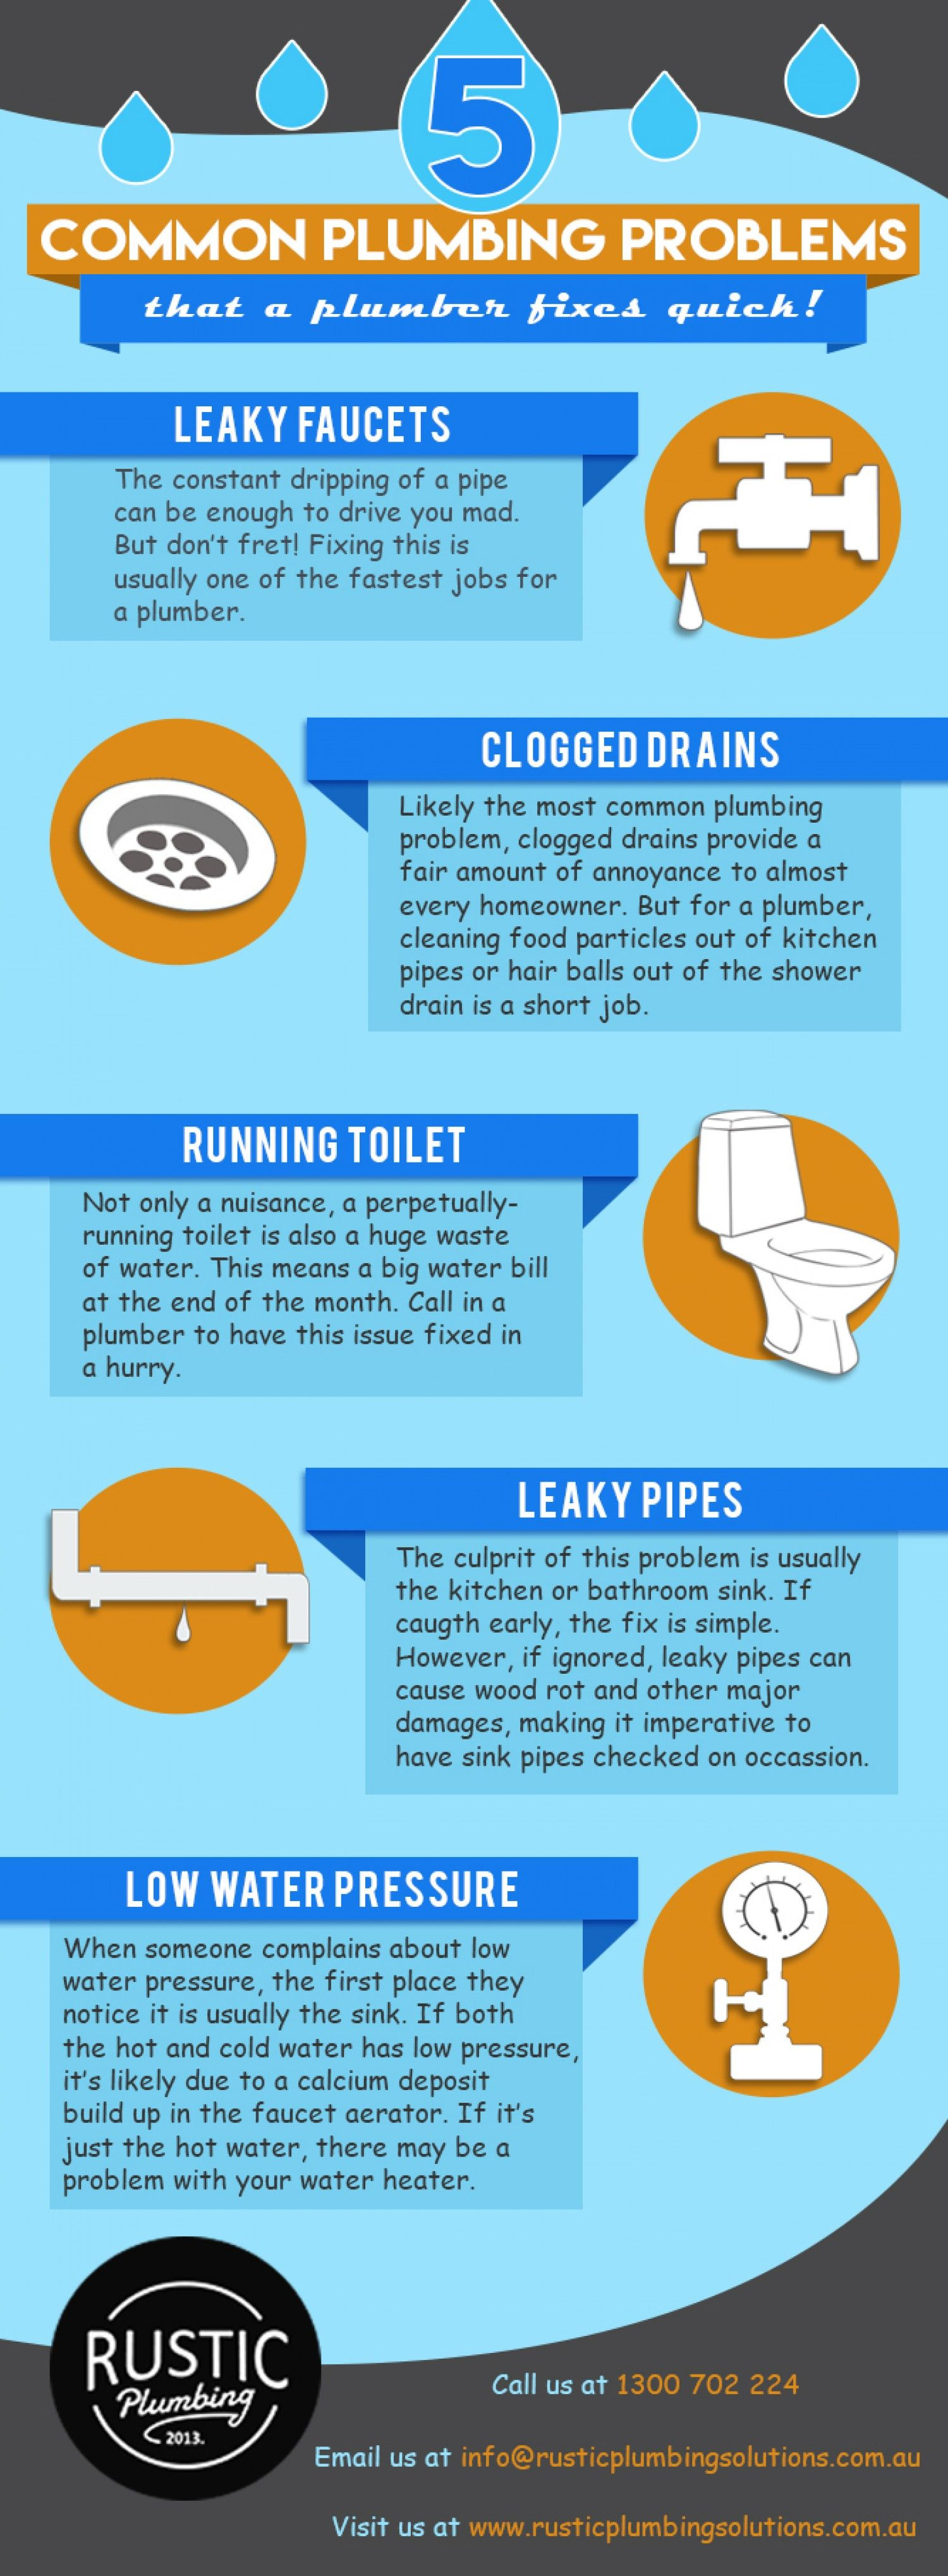 Top 5 Common Plumbing Problems Plumbing Problems Plumbing Leaky Faucet